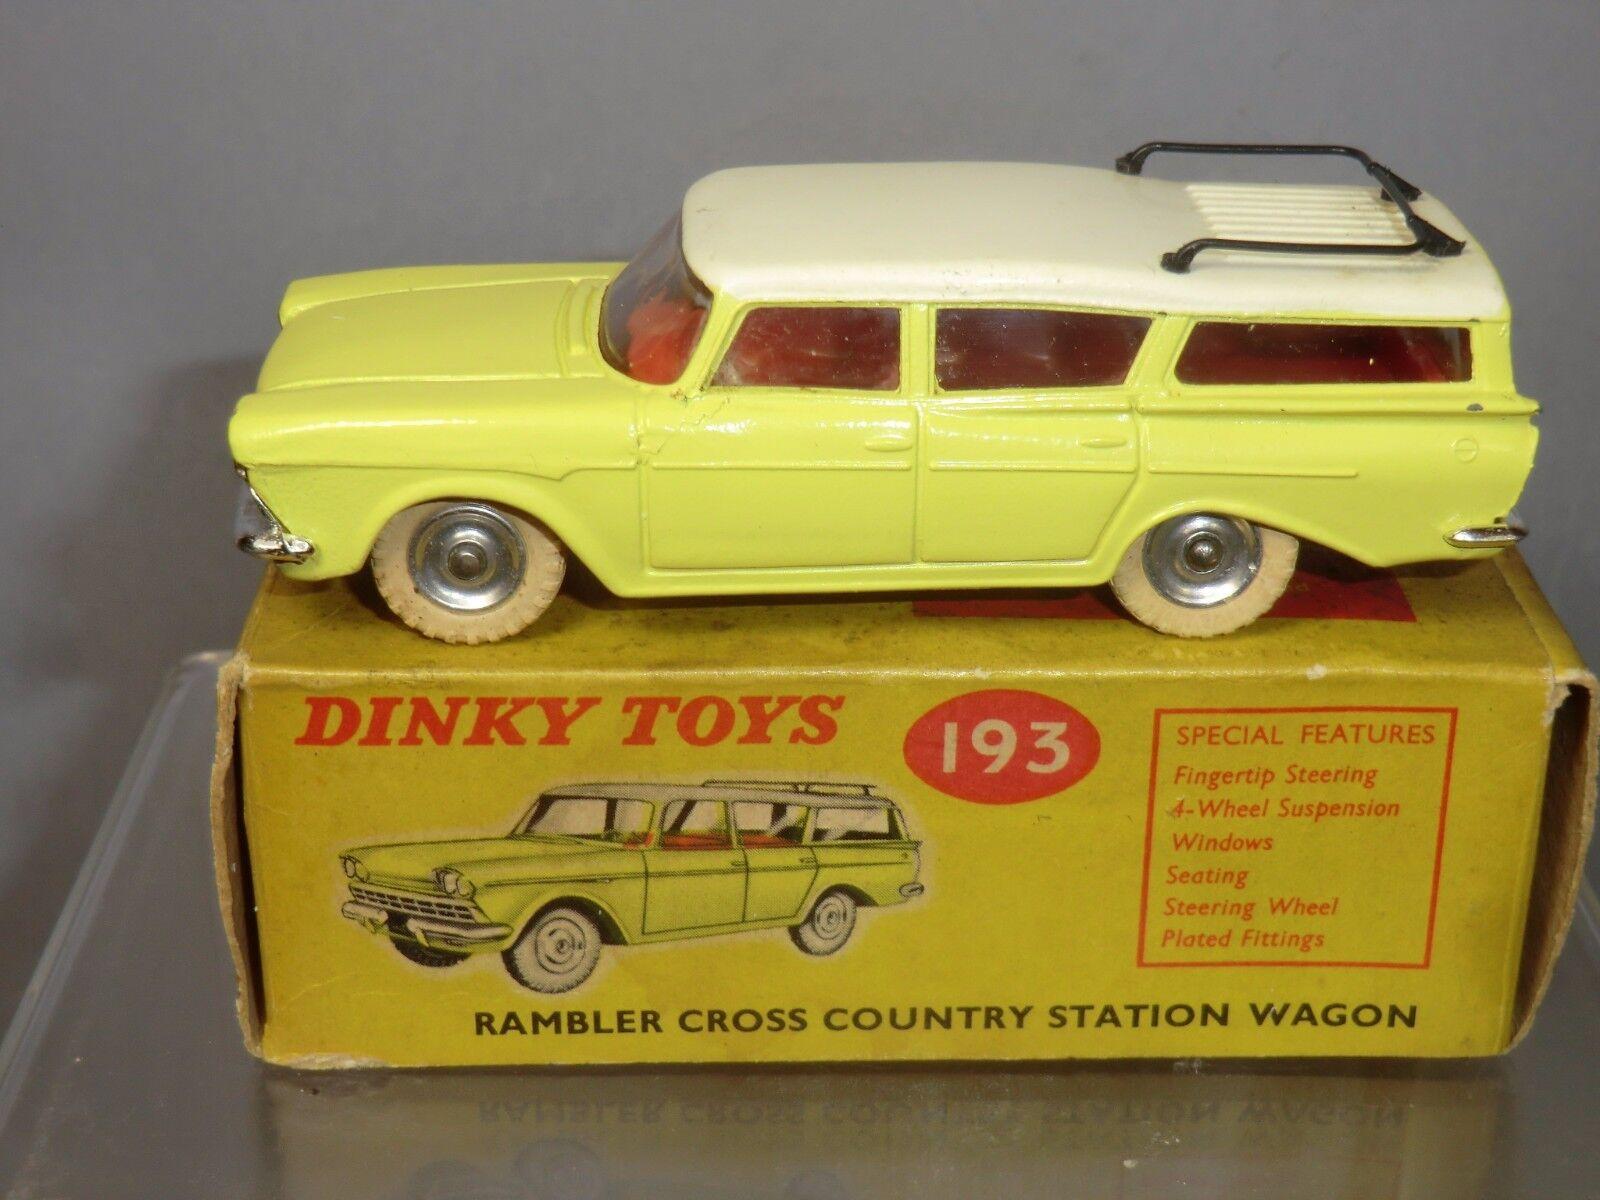 DINKY TOYS modèle No.193 Rambler Cross Country Station Wagon VN En parfait état, dans sa boîte | France